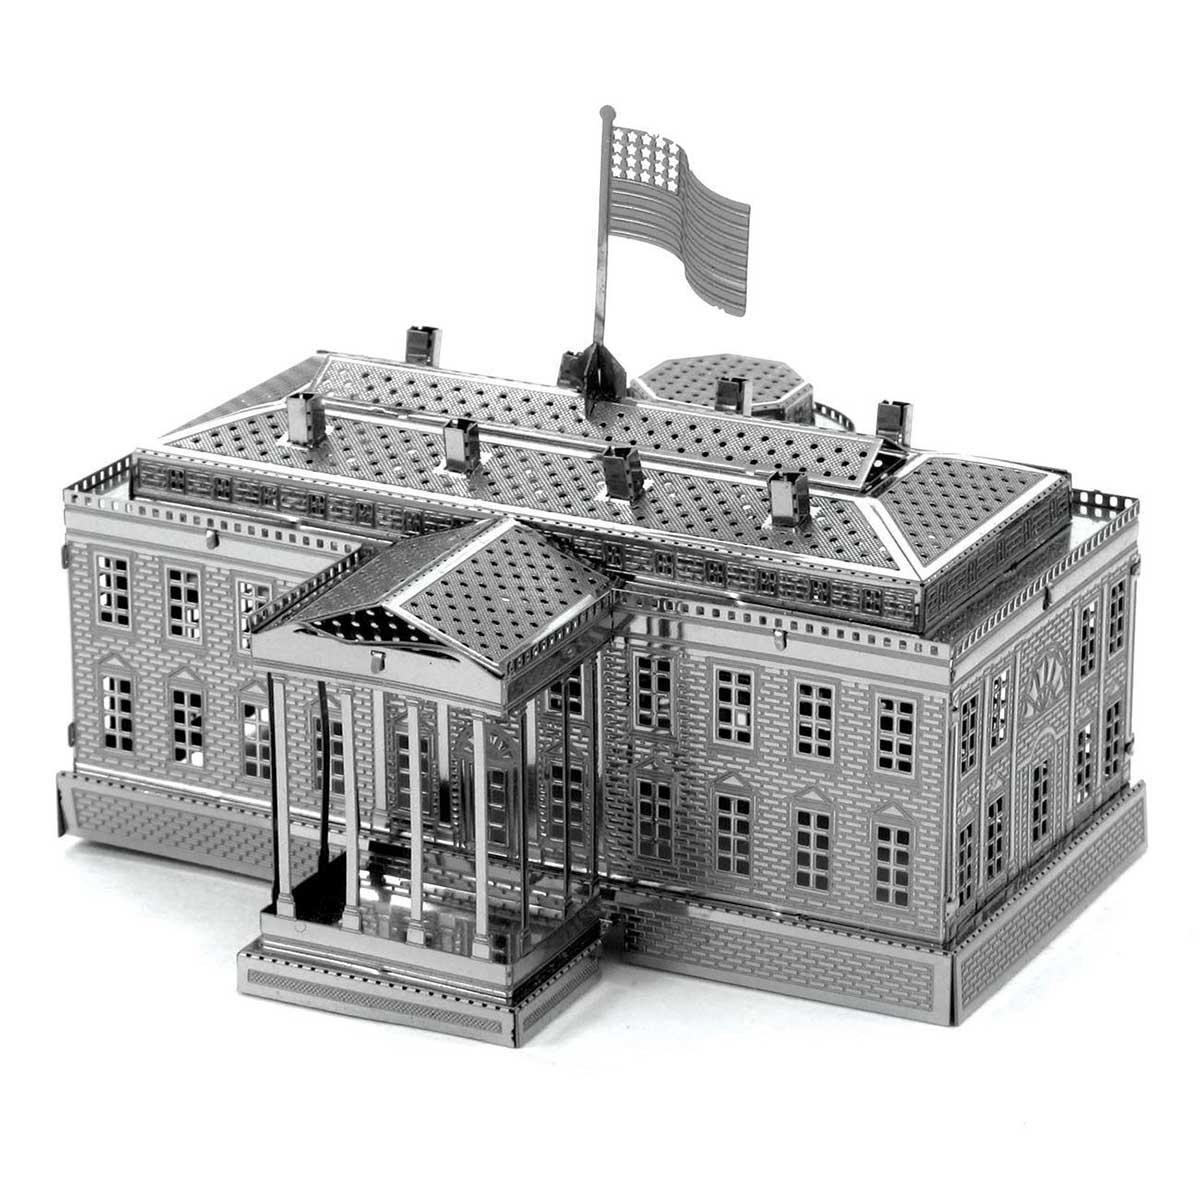 White House Landmarks / Monuments Metal Puzzles